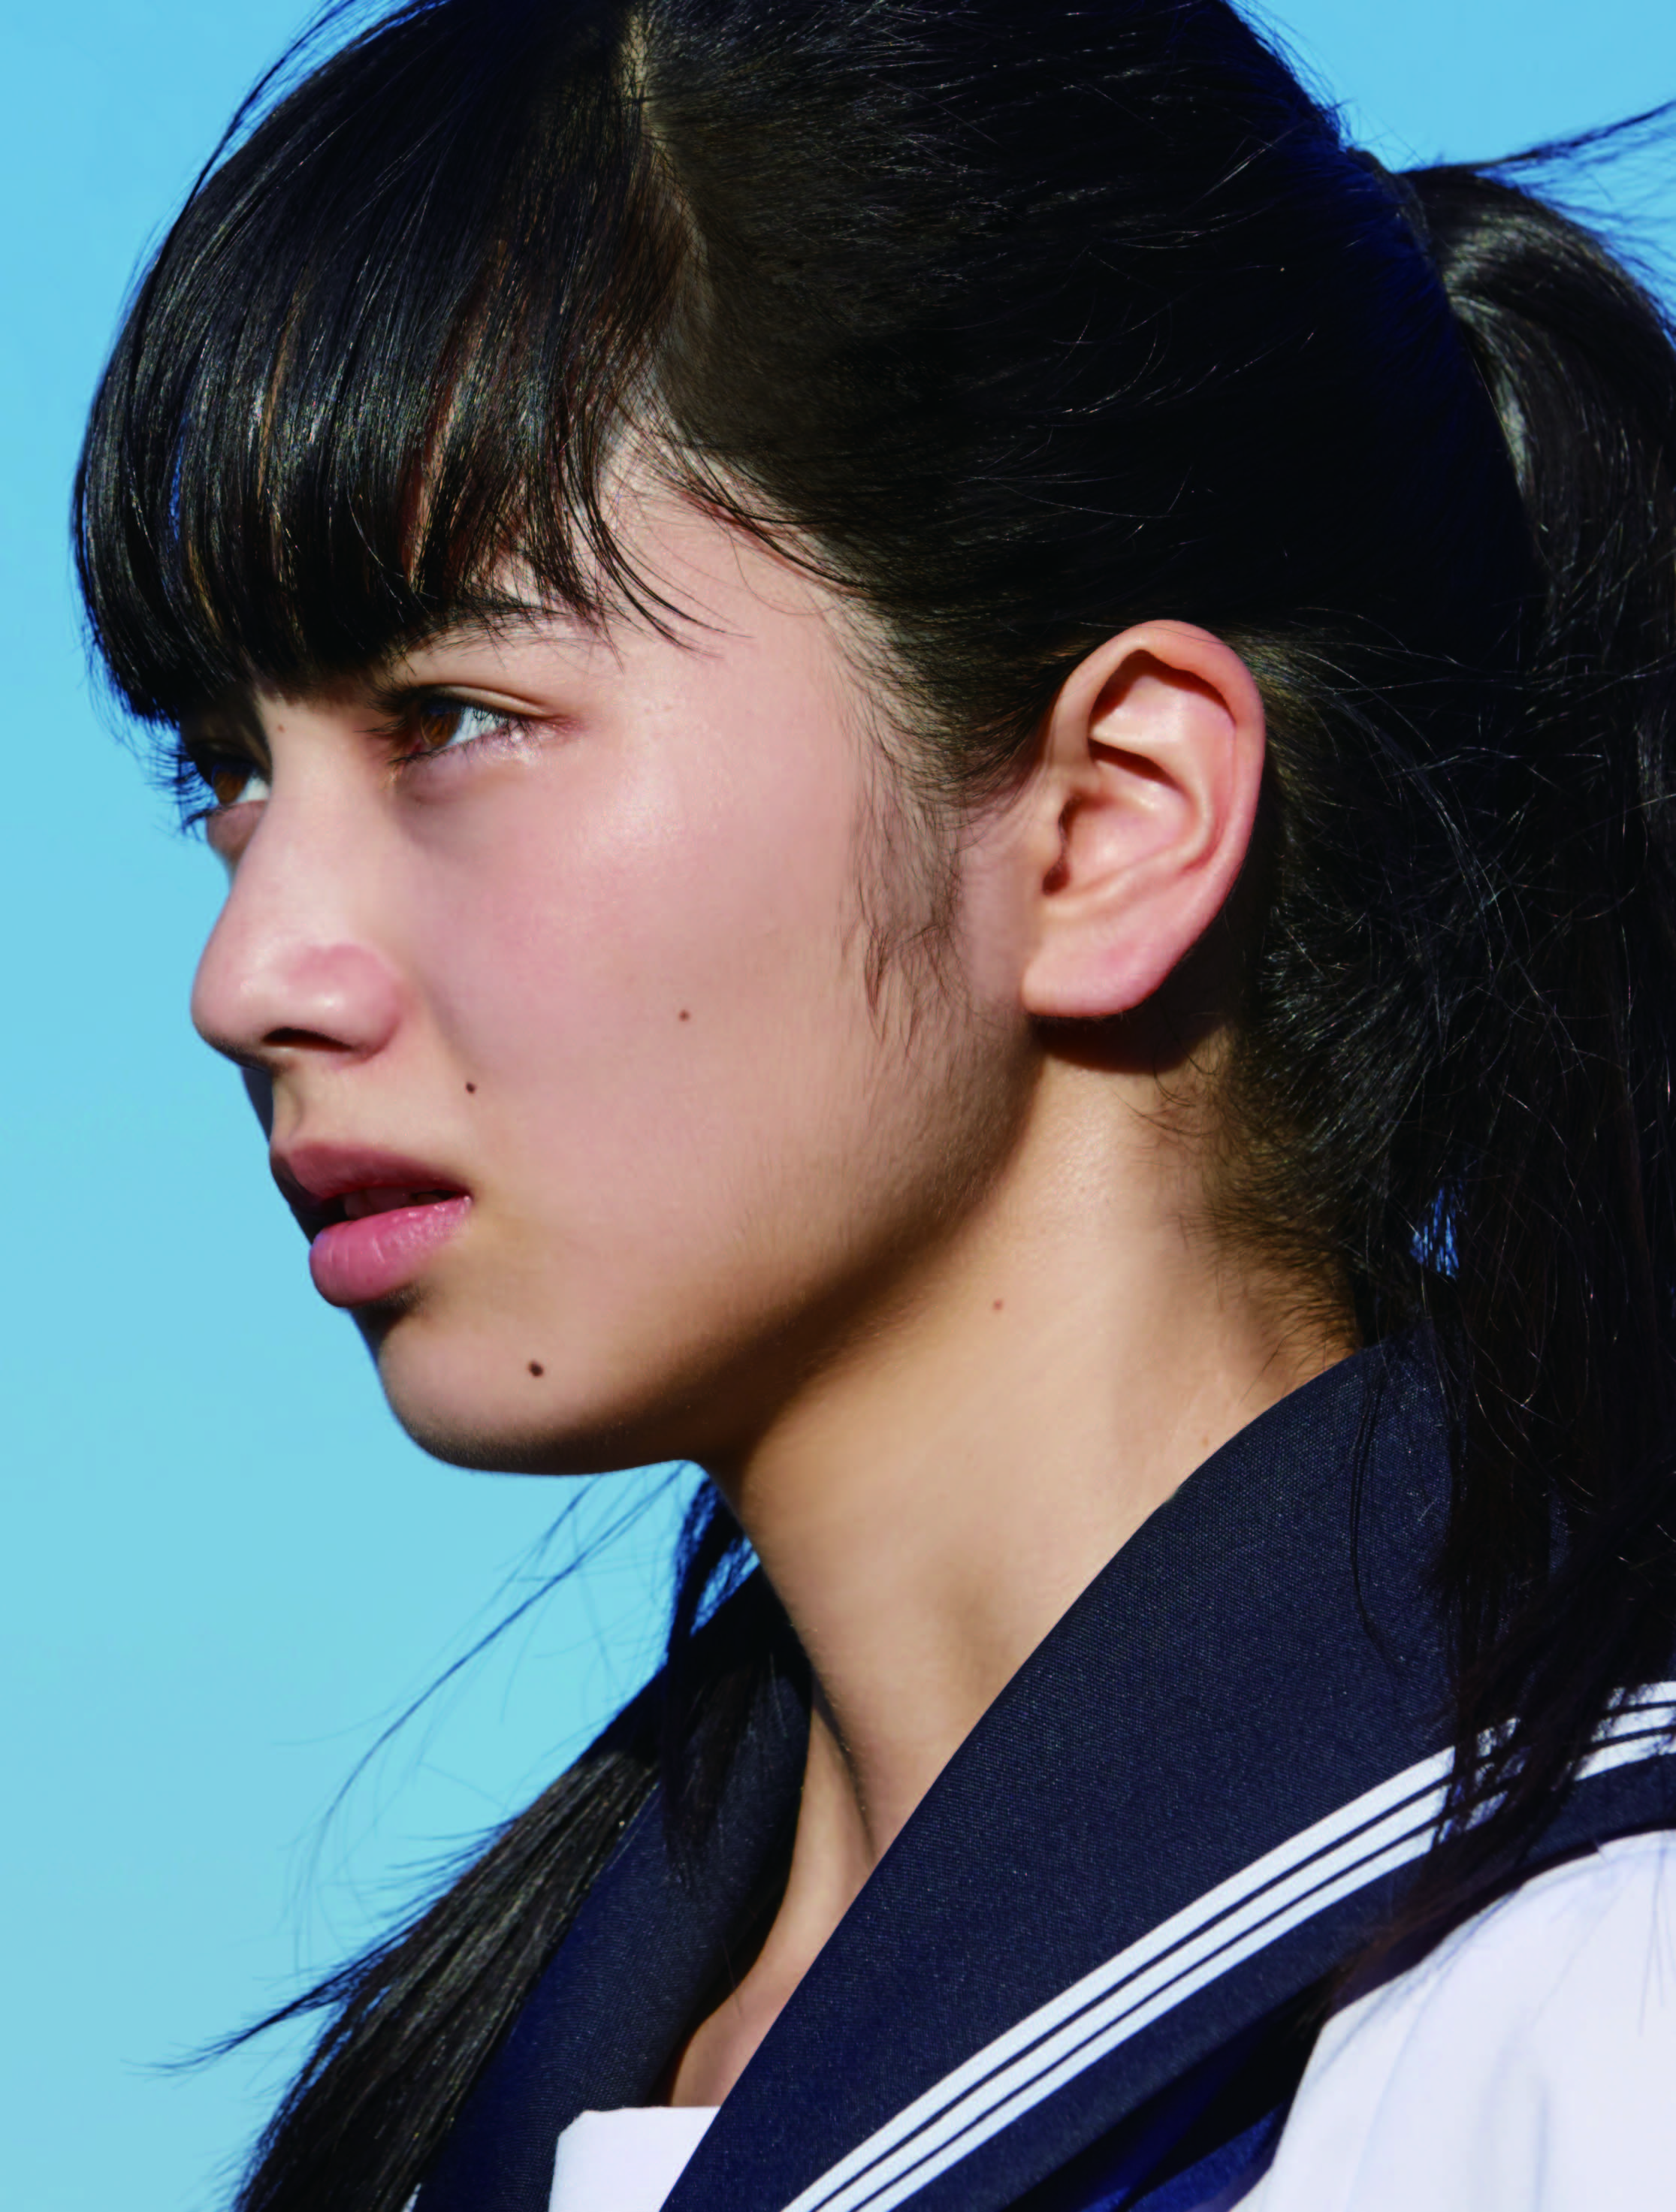 (C)ジョージ朝倉/講談社 (c)2016「溺れるナイフ」製作委員会